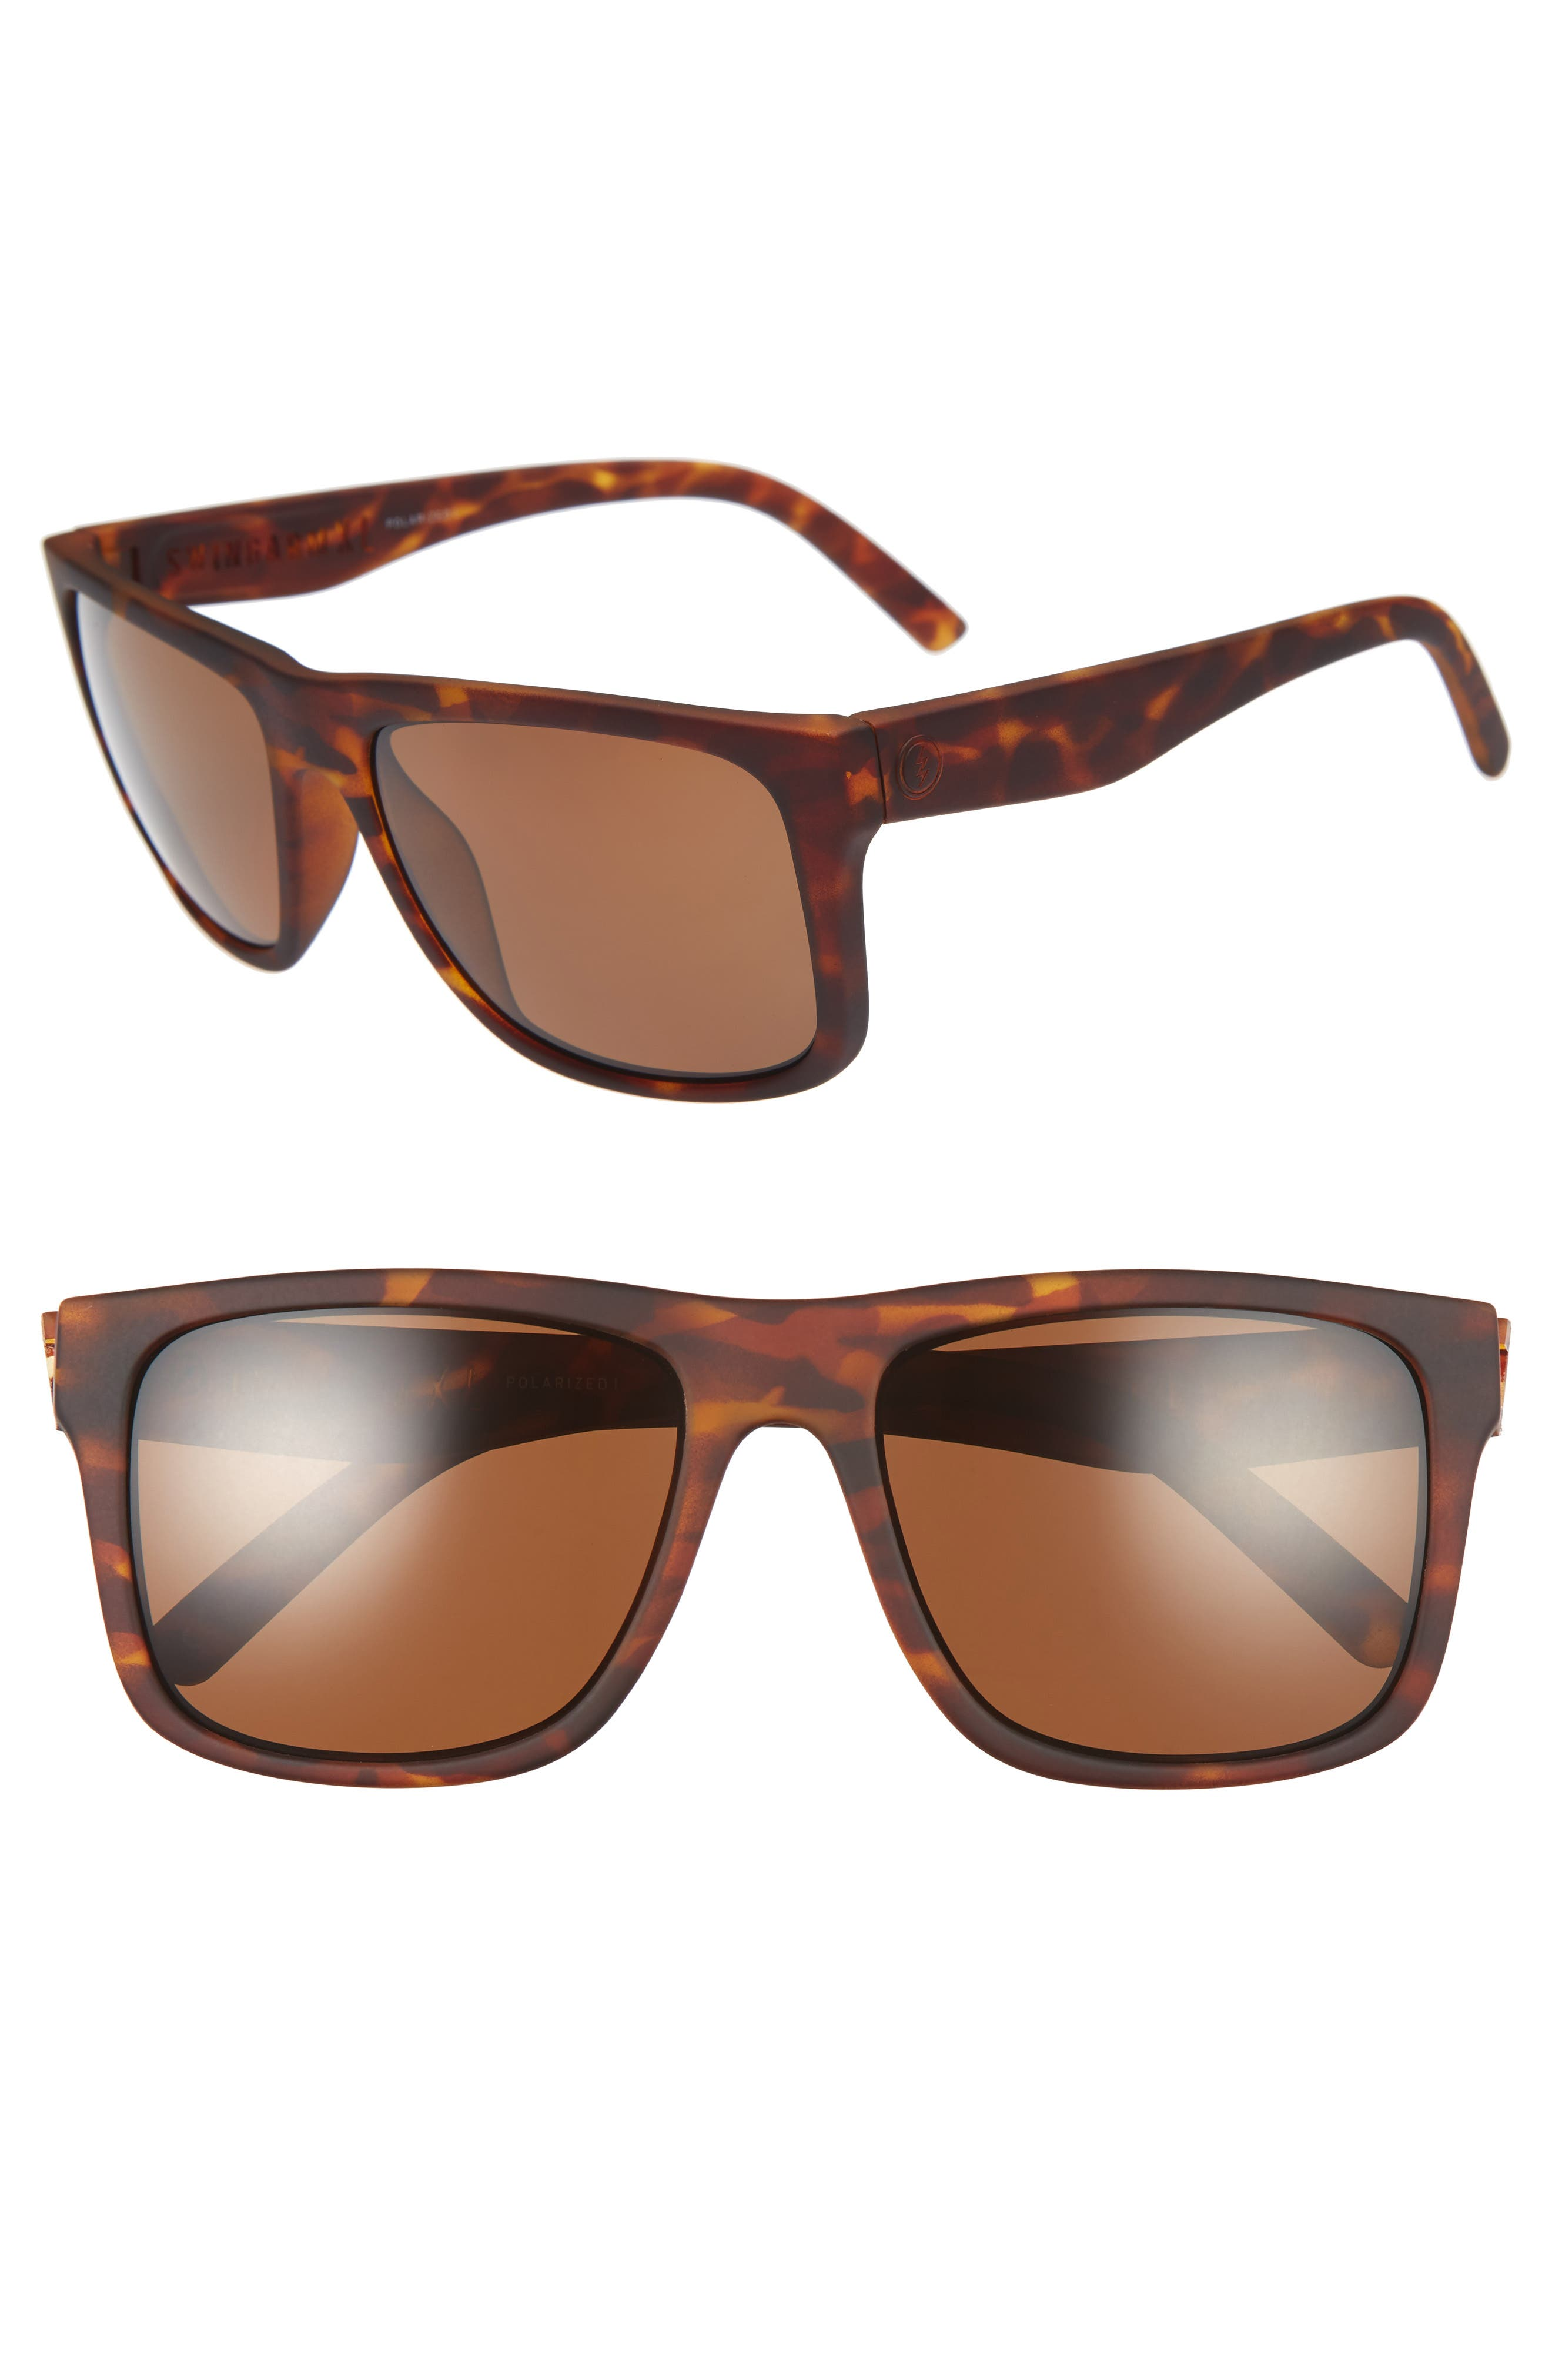 Swingarm XL 59mm Polarized Sunglasses,                         Main,                         color, 200